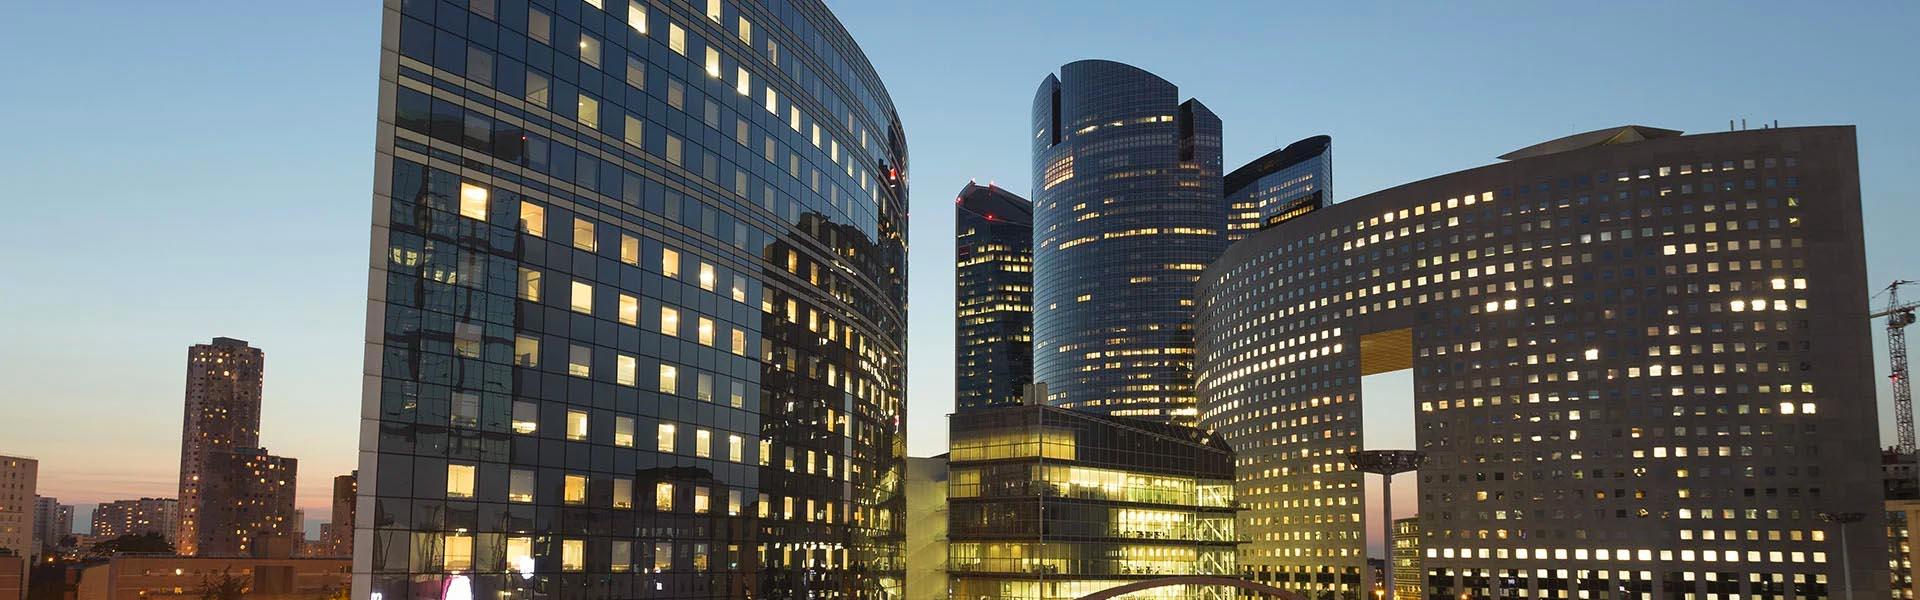 Accruent - Industries - Corporate Real Estate Management - Hero